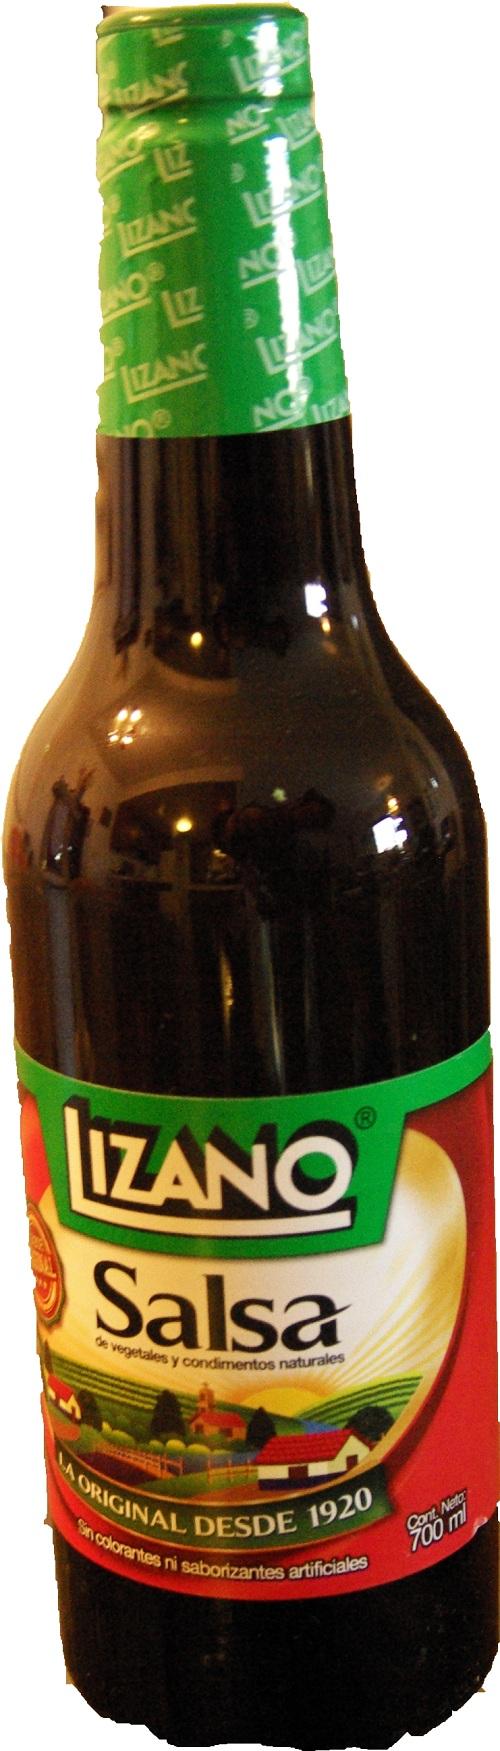 Lizano Salsa - 700 mL - Lizano Sauce